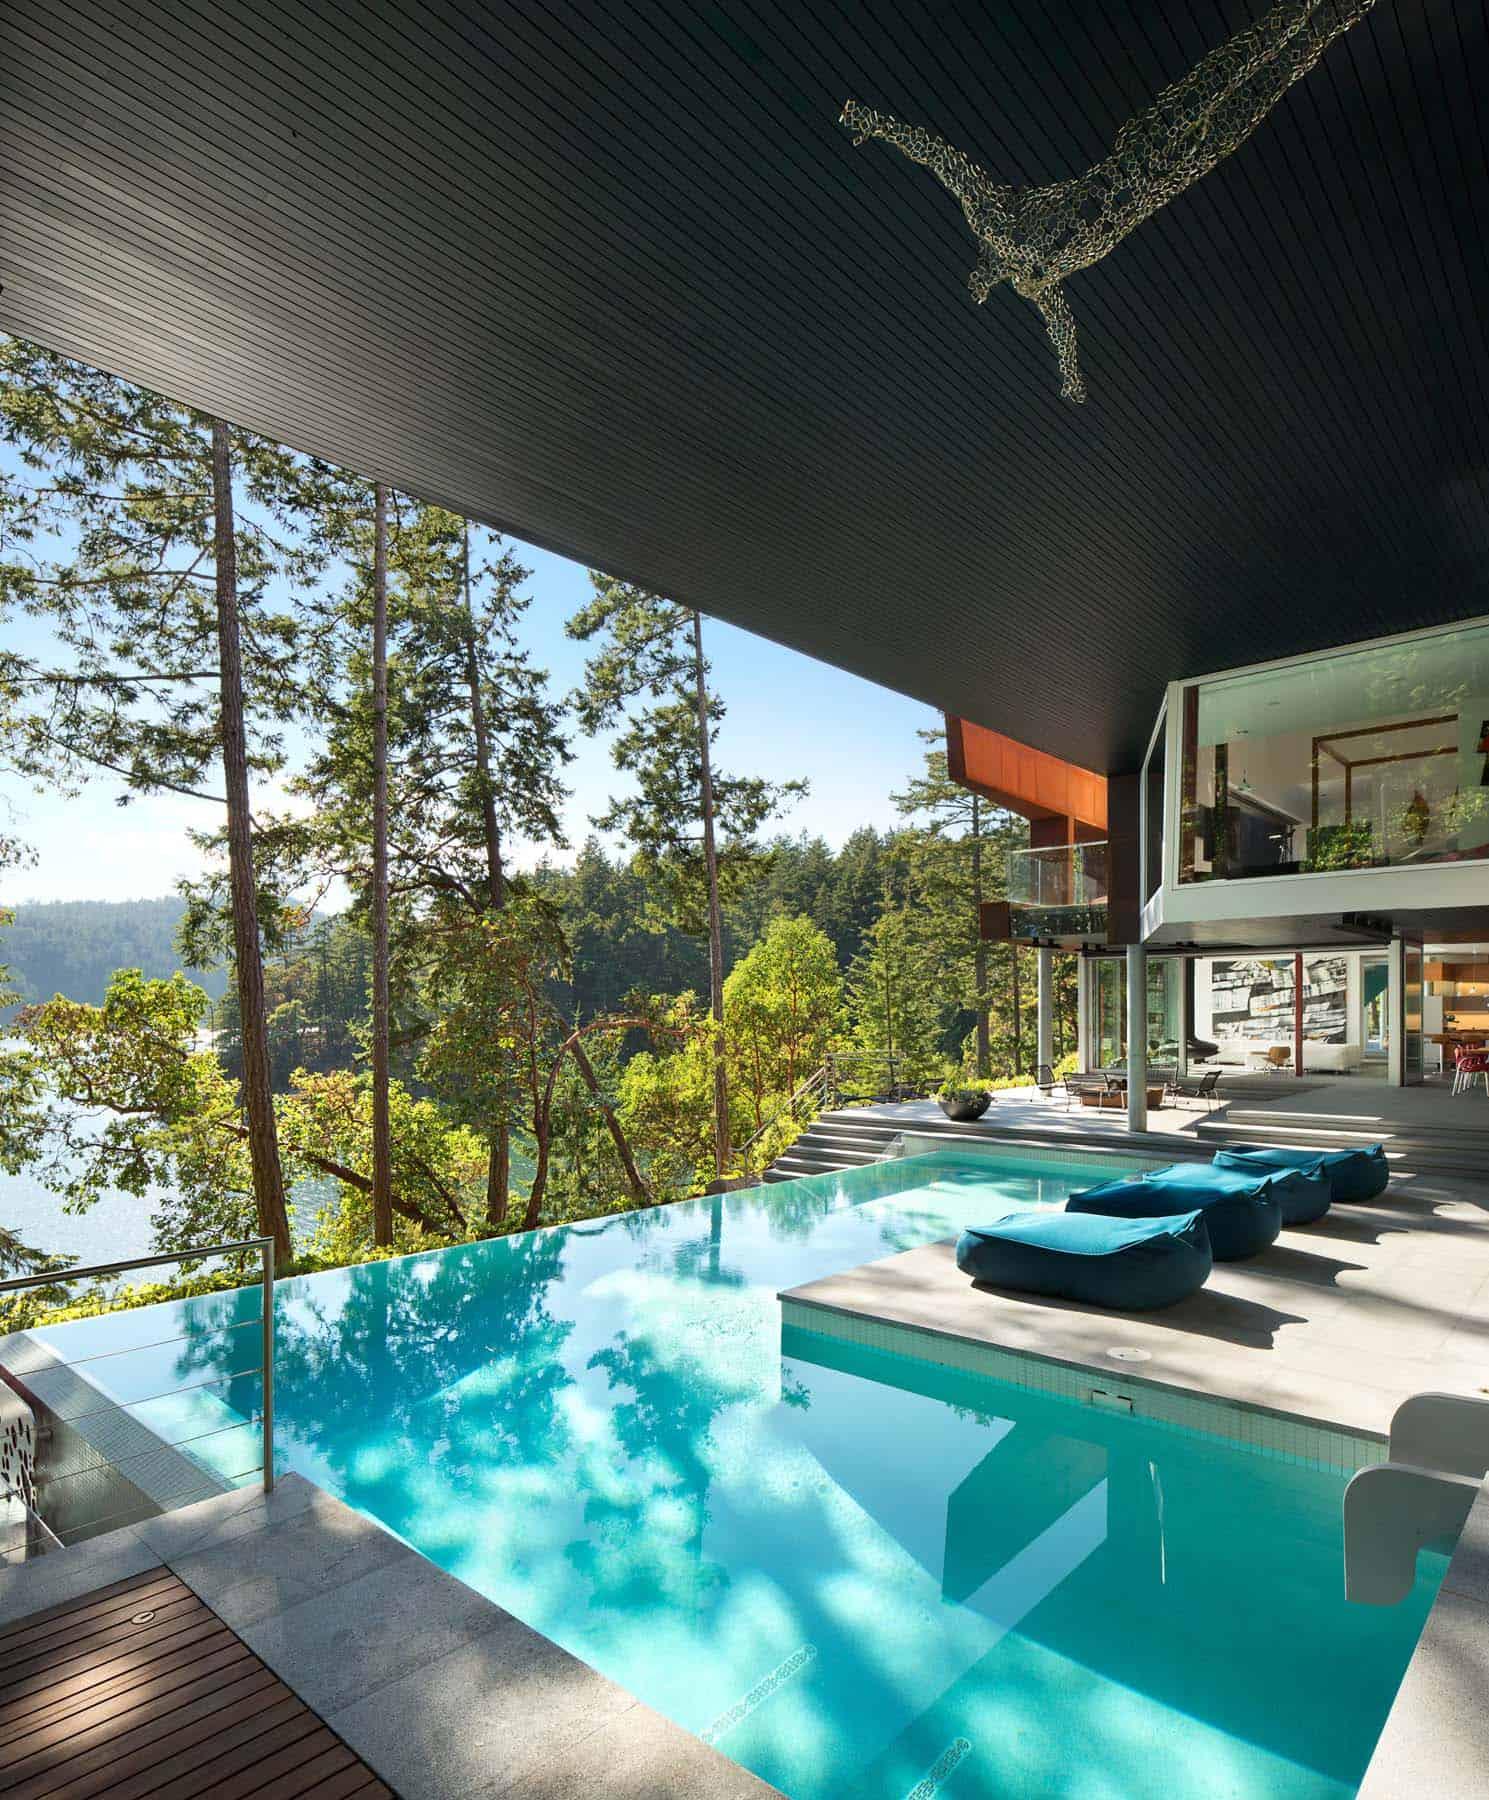 Gulf Islands Residence-AA Robins Architect-08-1 Kindesign